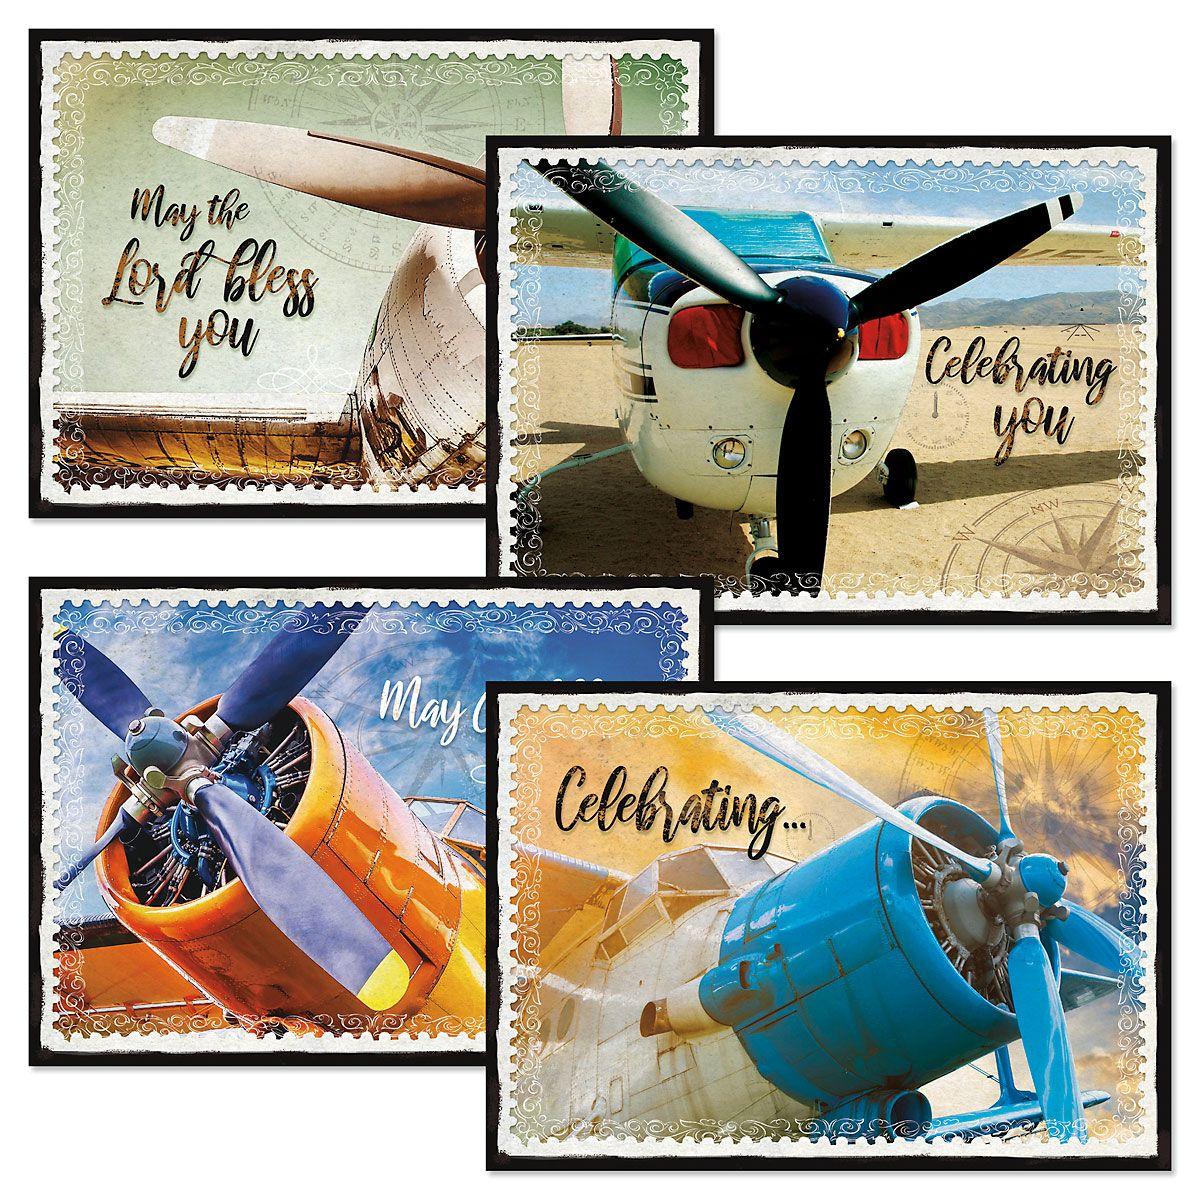 Retro Planes Birthday Cards and Seals